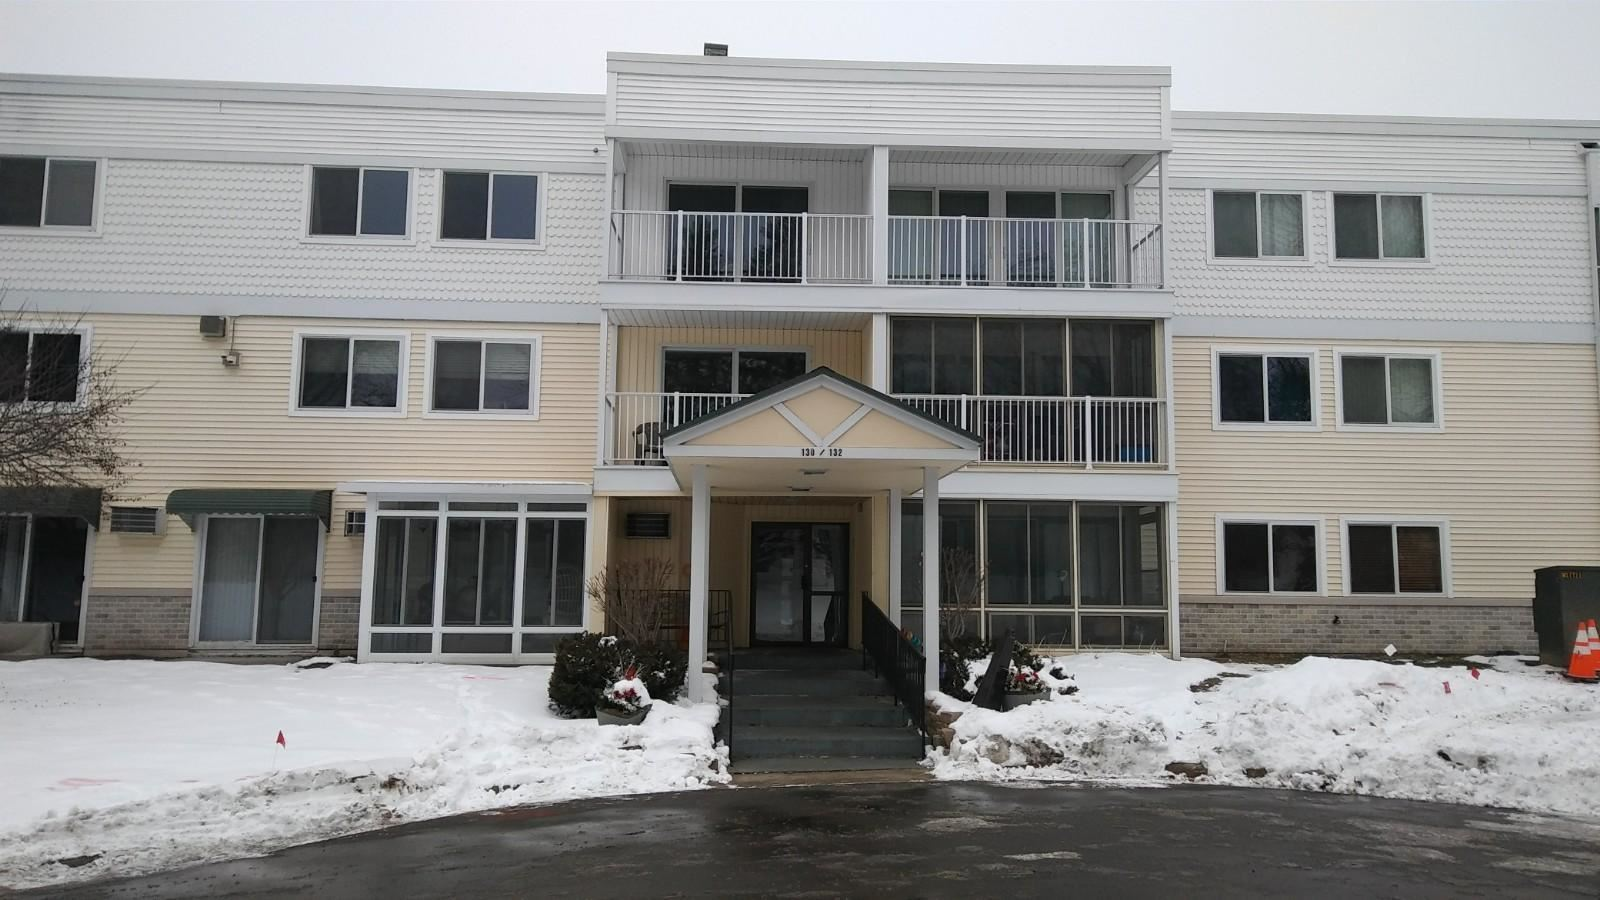 132 Demont Avenue E #227, Little Canada, MN 55117 - MLS#: 5700744